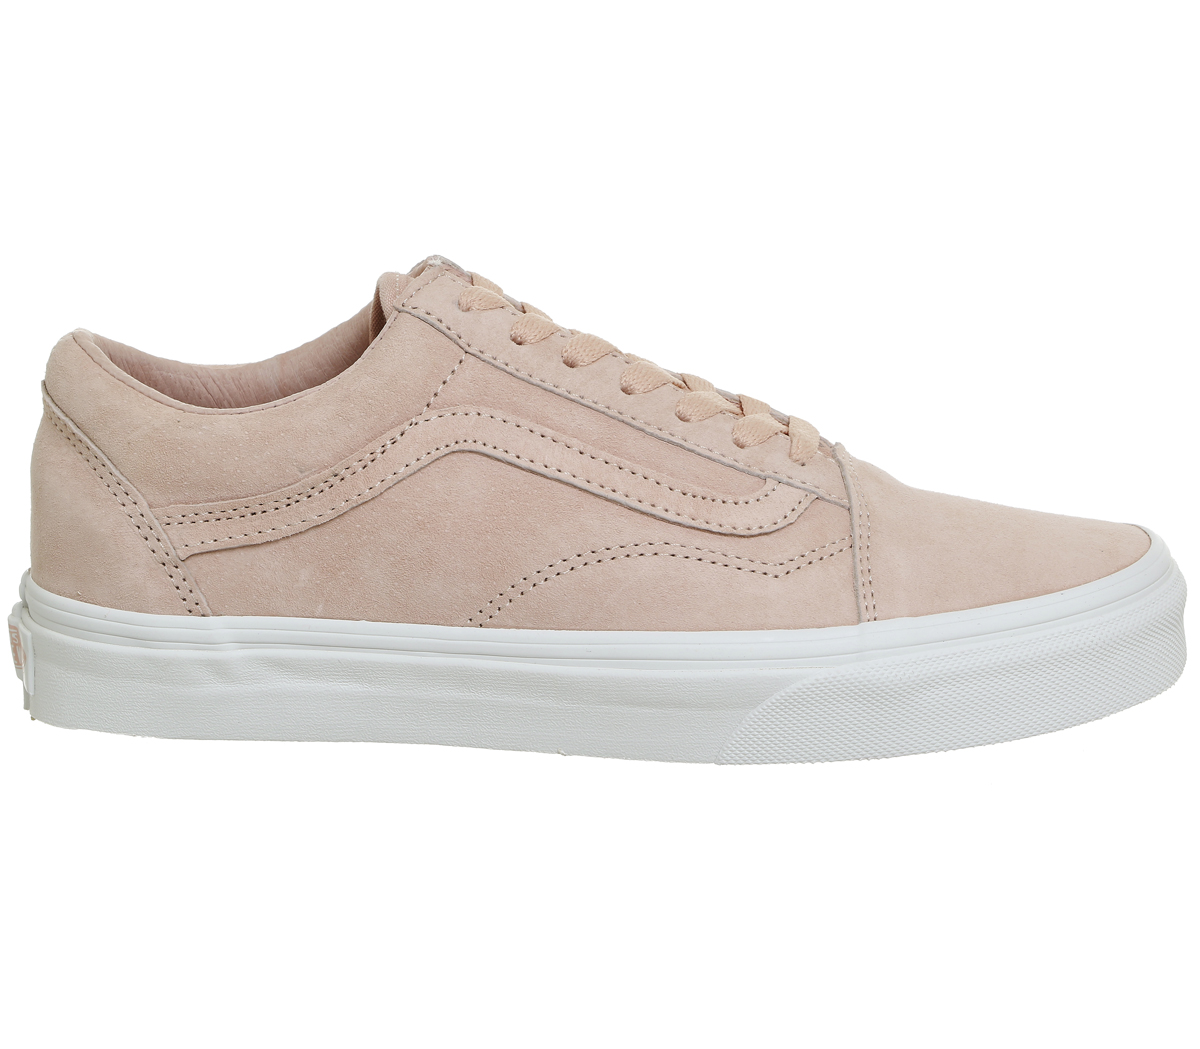 Sentinel Mens Vans Old Skool SPANISH VILLA SUEDE TRUE WHITE Trainers Shoes 17b3685ec2fd